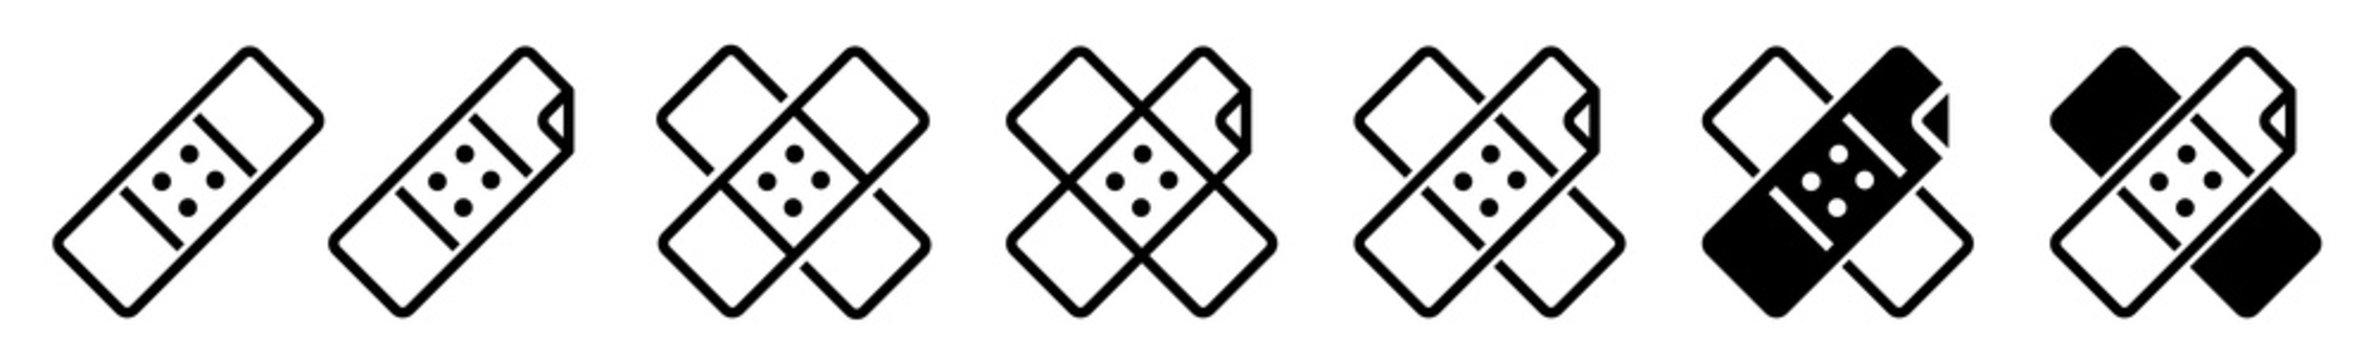 Band Aid Icon Black | Plaster Illustration | Wound Care Symbol | Injury Pain Logo | Injured Sign | Isolated | Variations